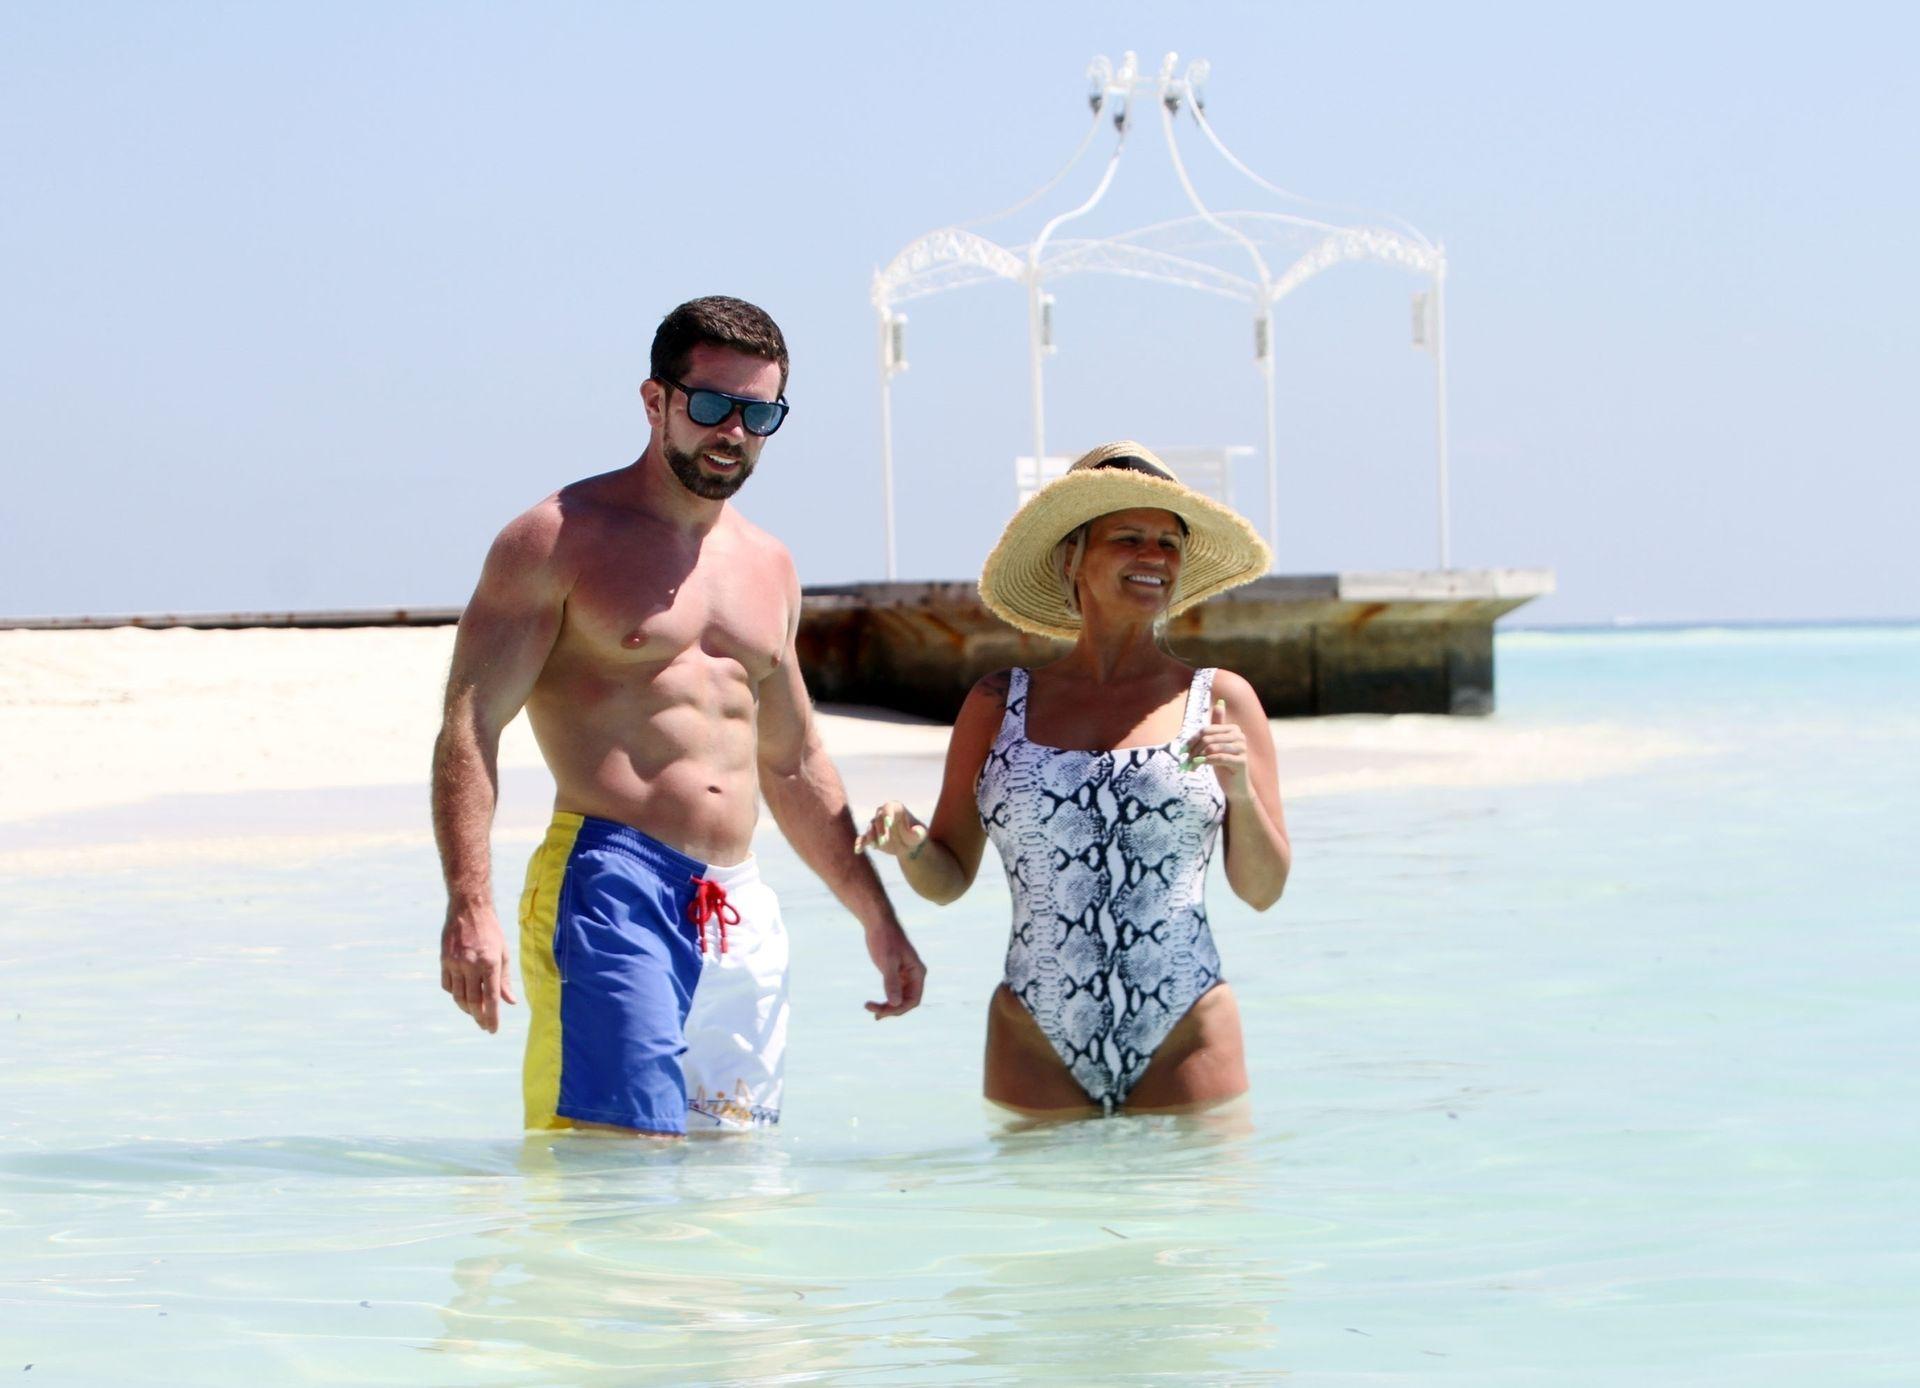 Kerry Katona & Ryan Mahoney Hit The Beach On Holiday At Their Luxury 5 Star Resort Ayada Maldives 0017